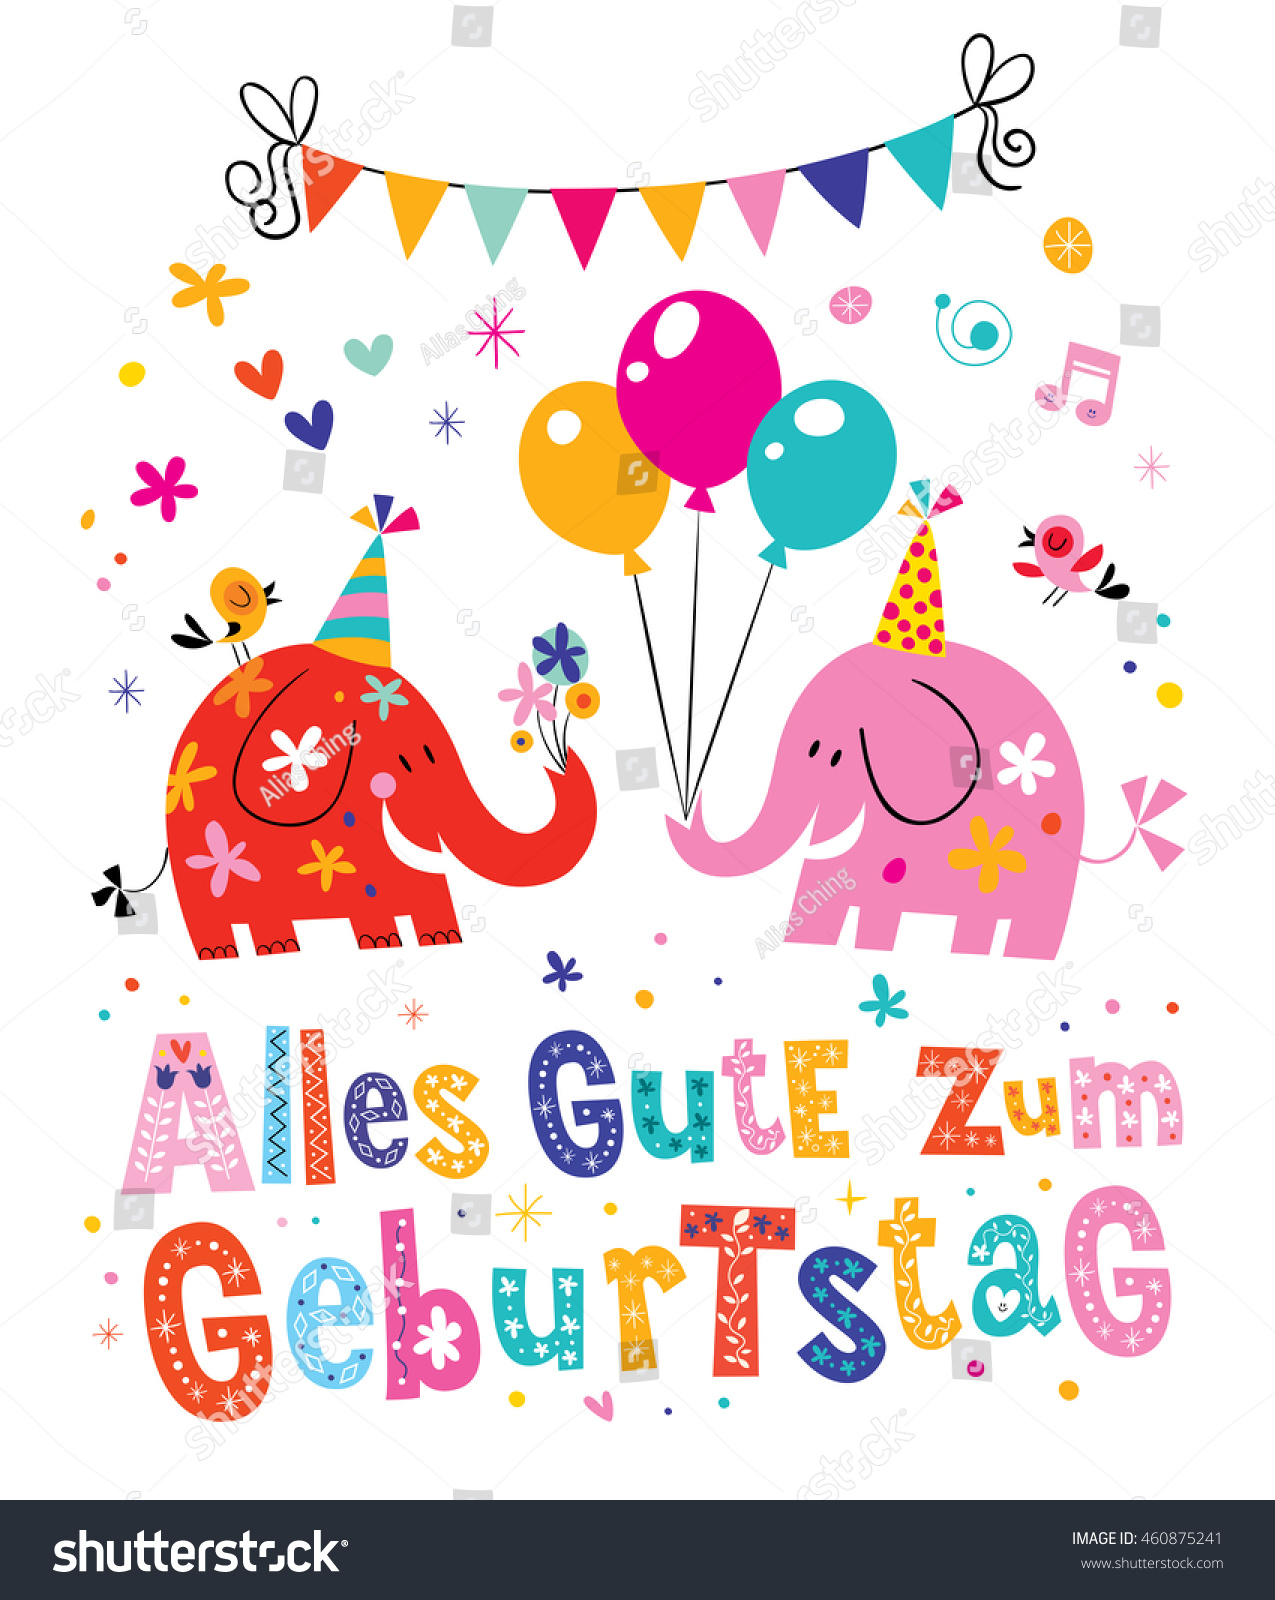 Alles Gute Zum Geburtstag Deutsch German Stock Vector